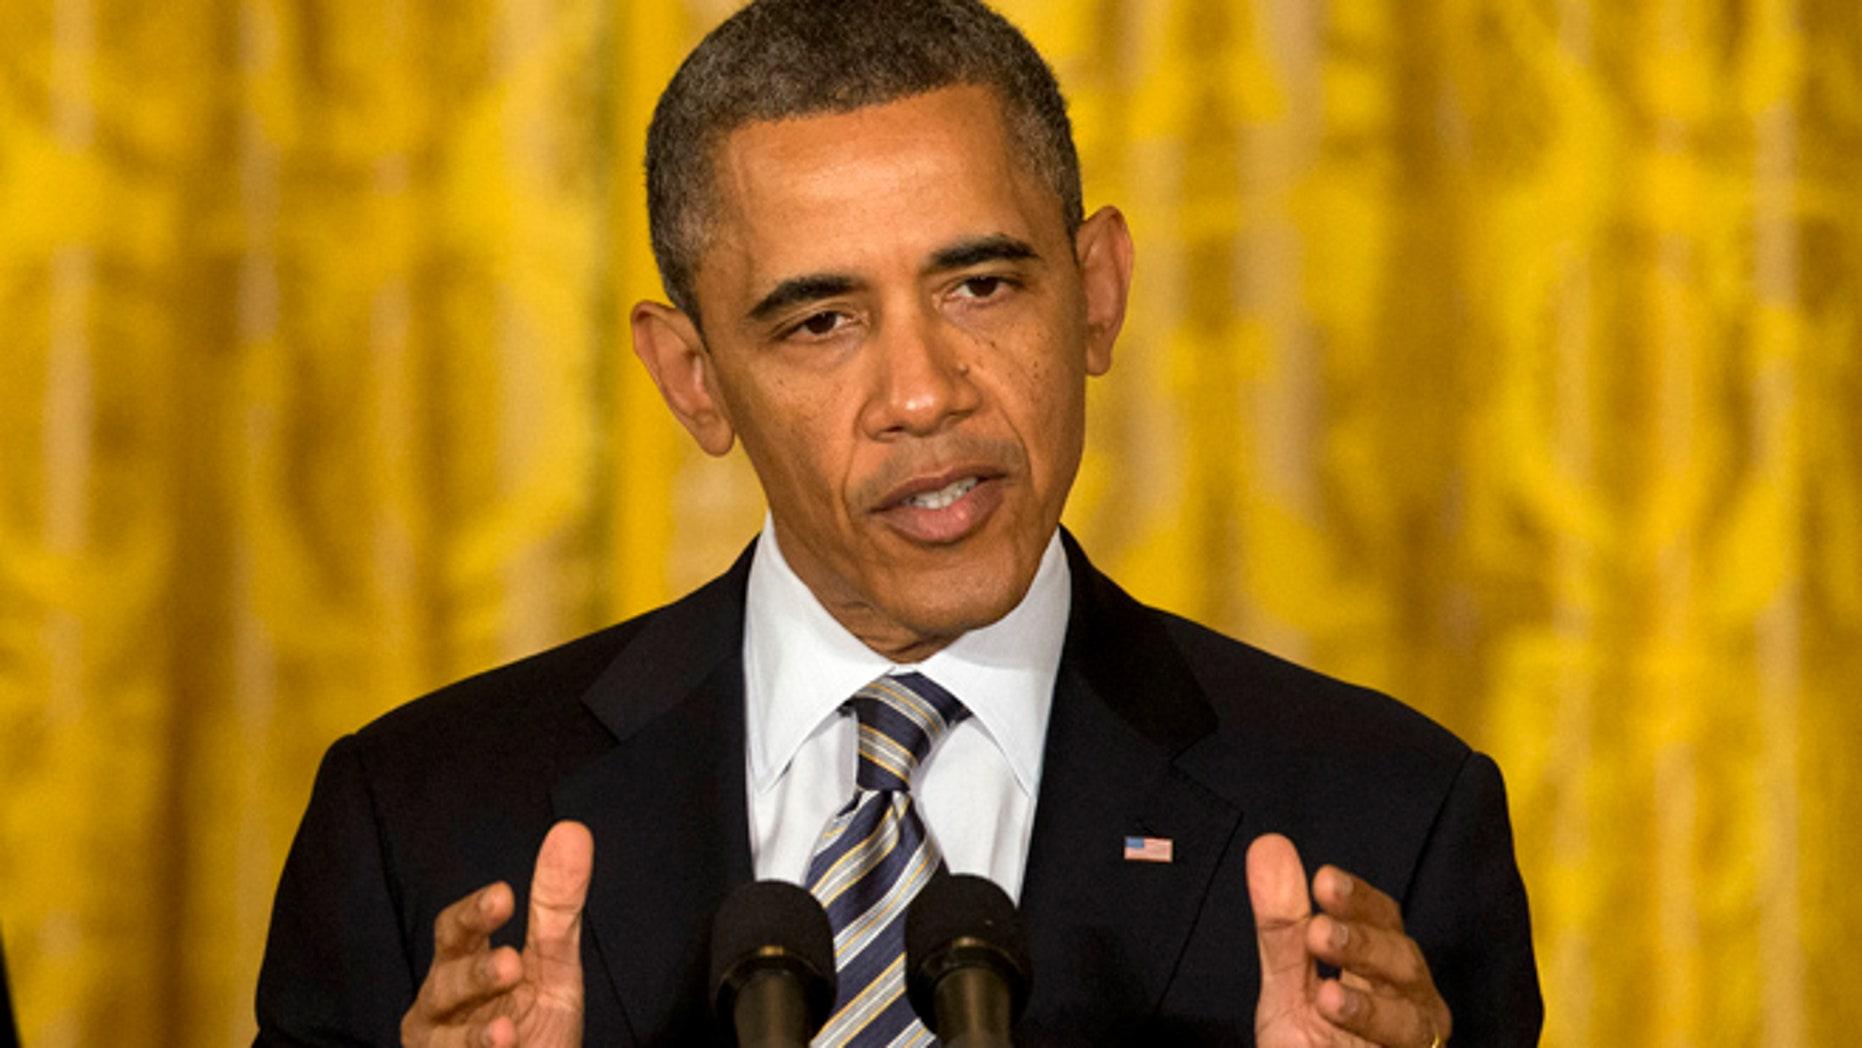 President Obama.